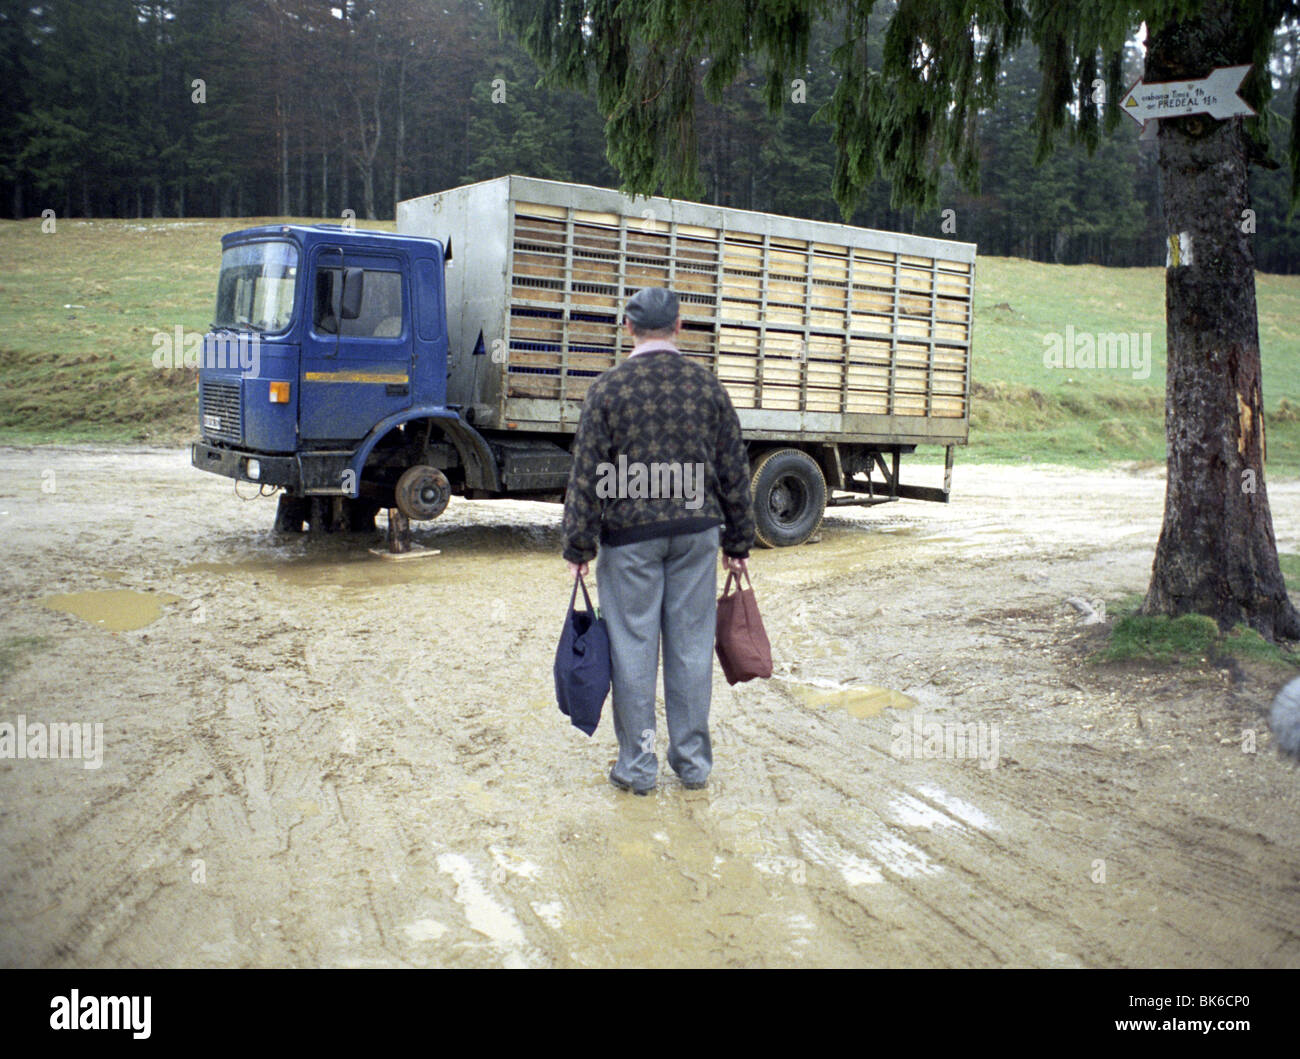 Amintiri din epoca de aur la légende de l'année chickendriver 2009 Administration de Cristian Mungiu, Photo Stock